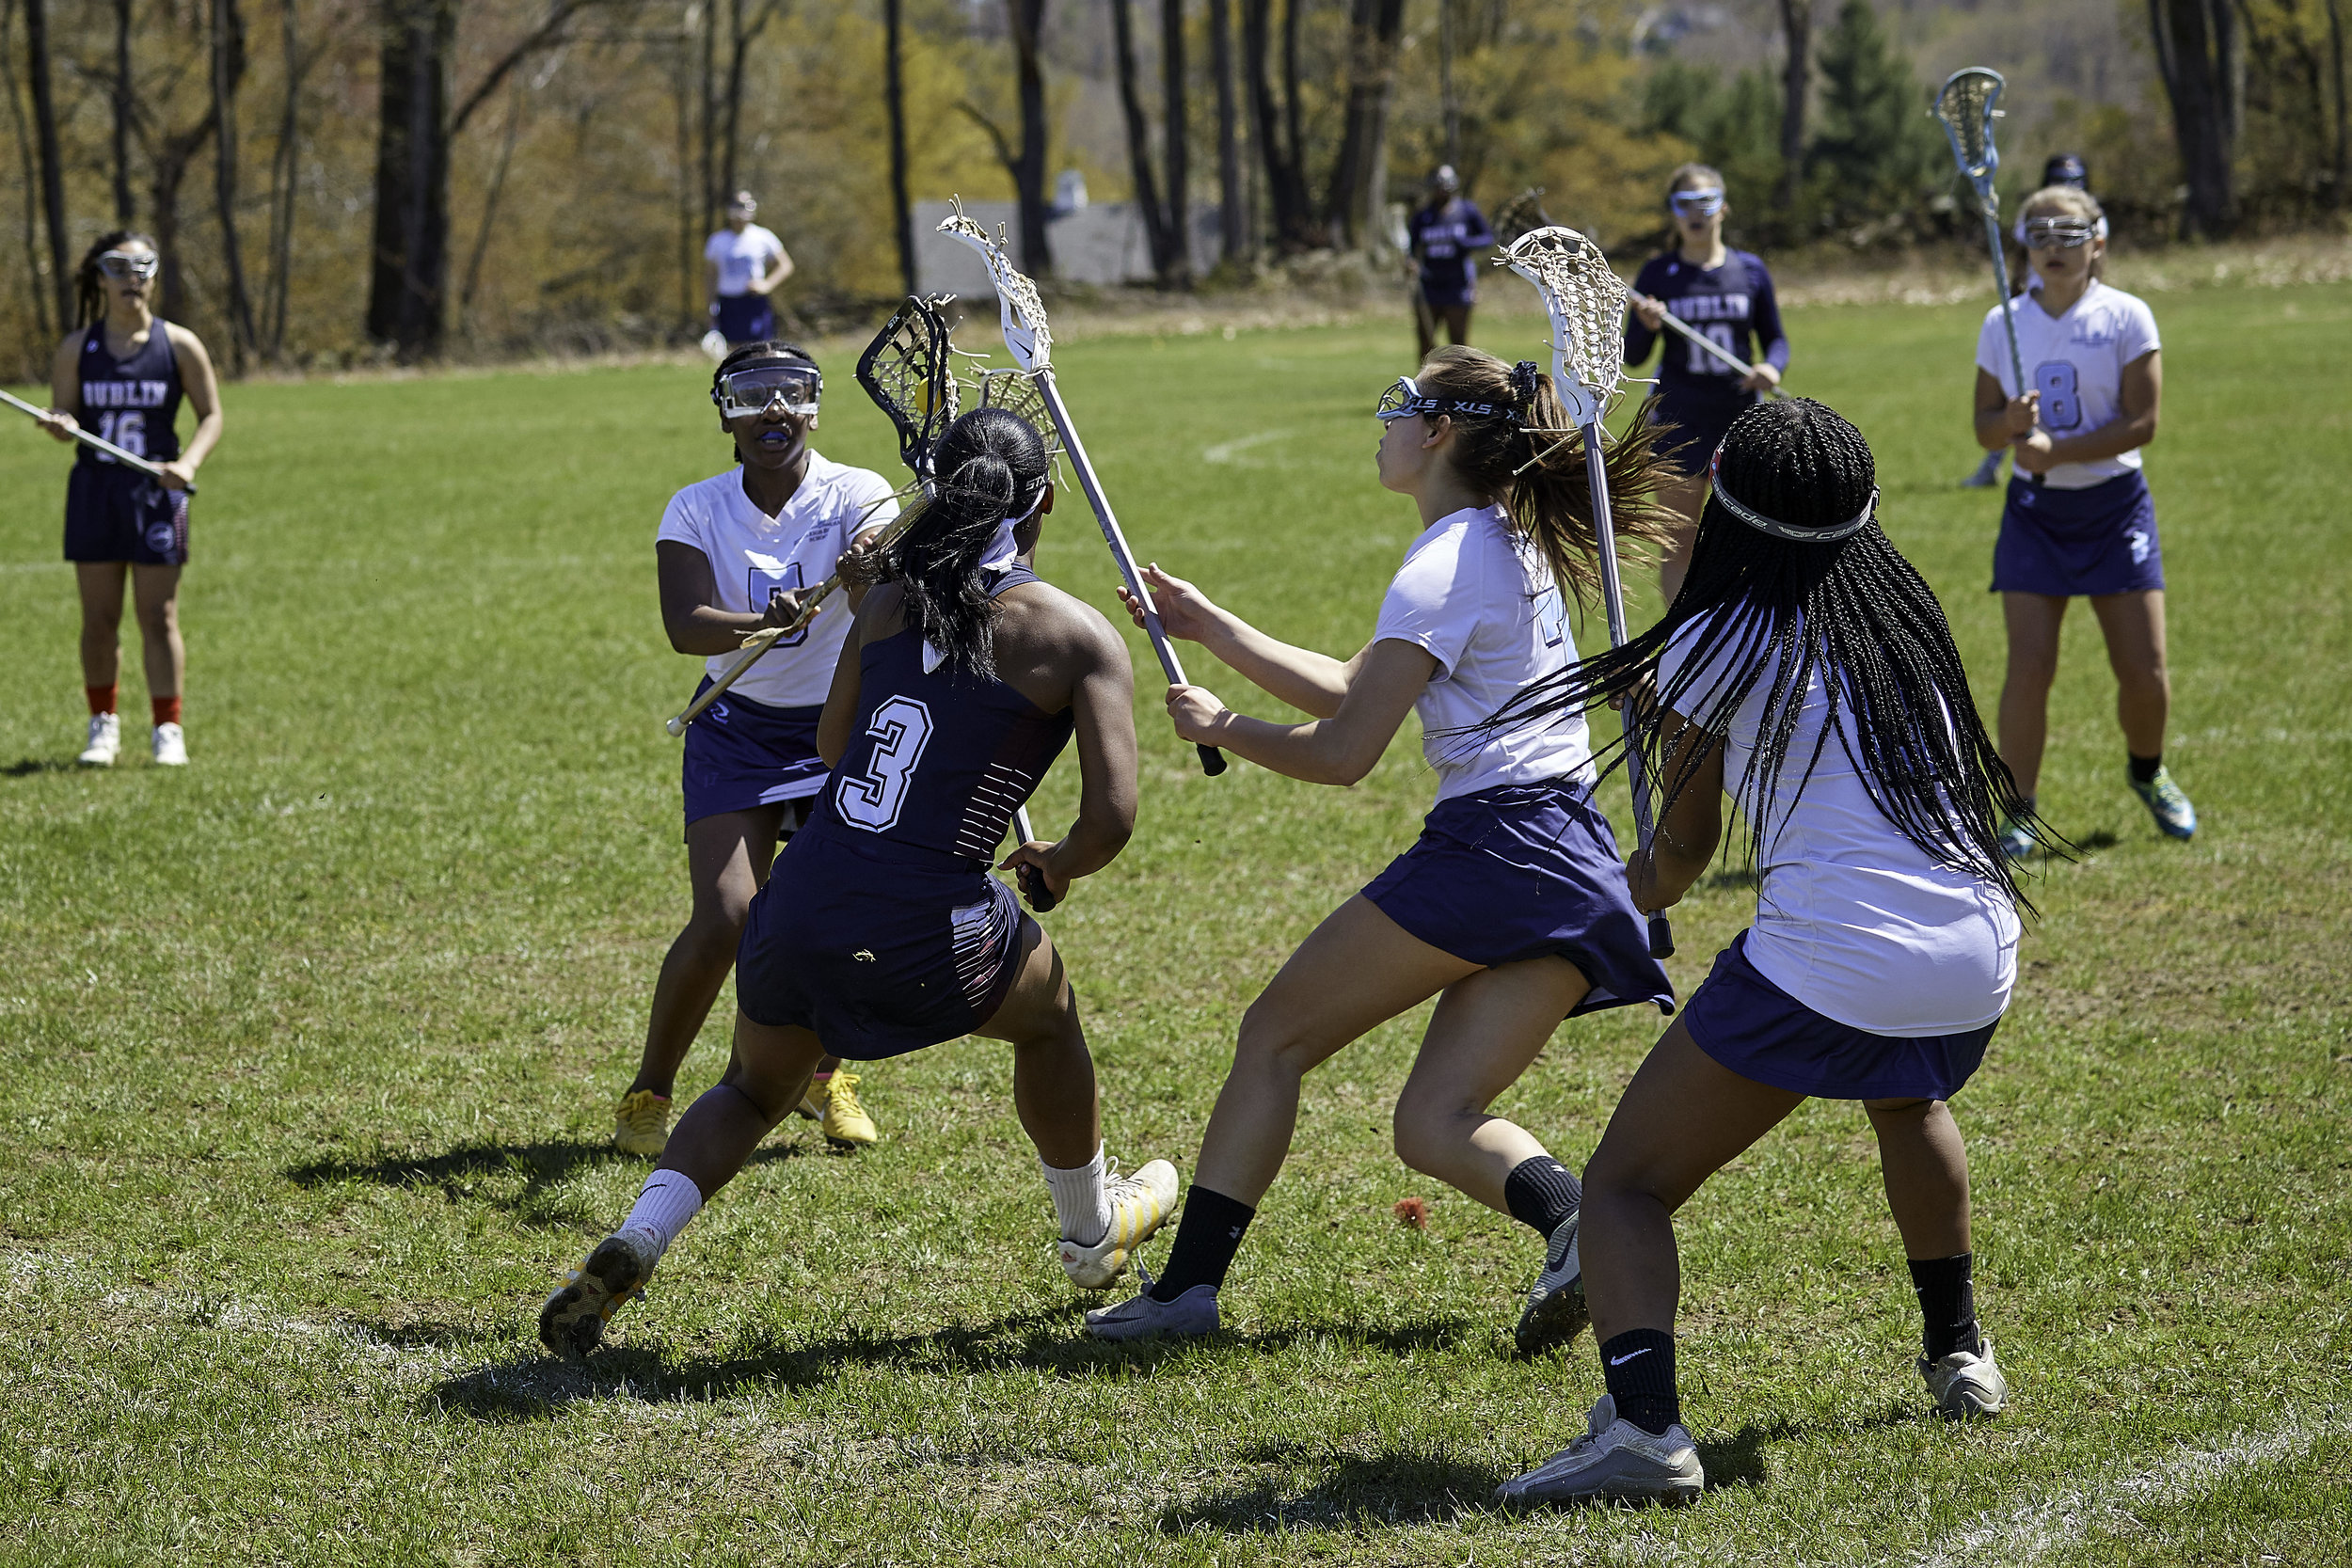 Girls Lacrosse vs. Stoneleigh Burnham School - May 11, 2019 - May 10, 2019193239.jpg